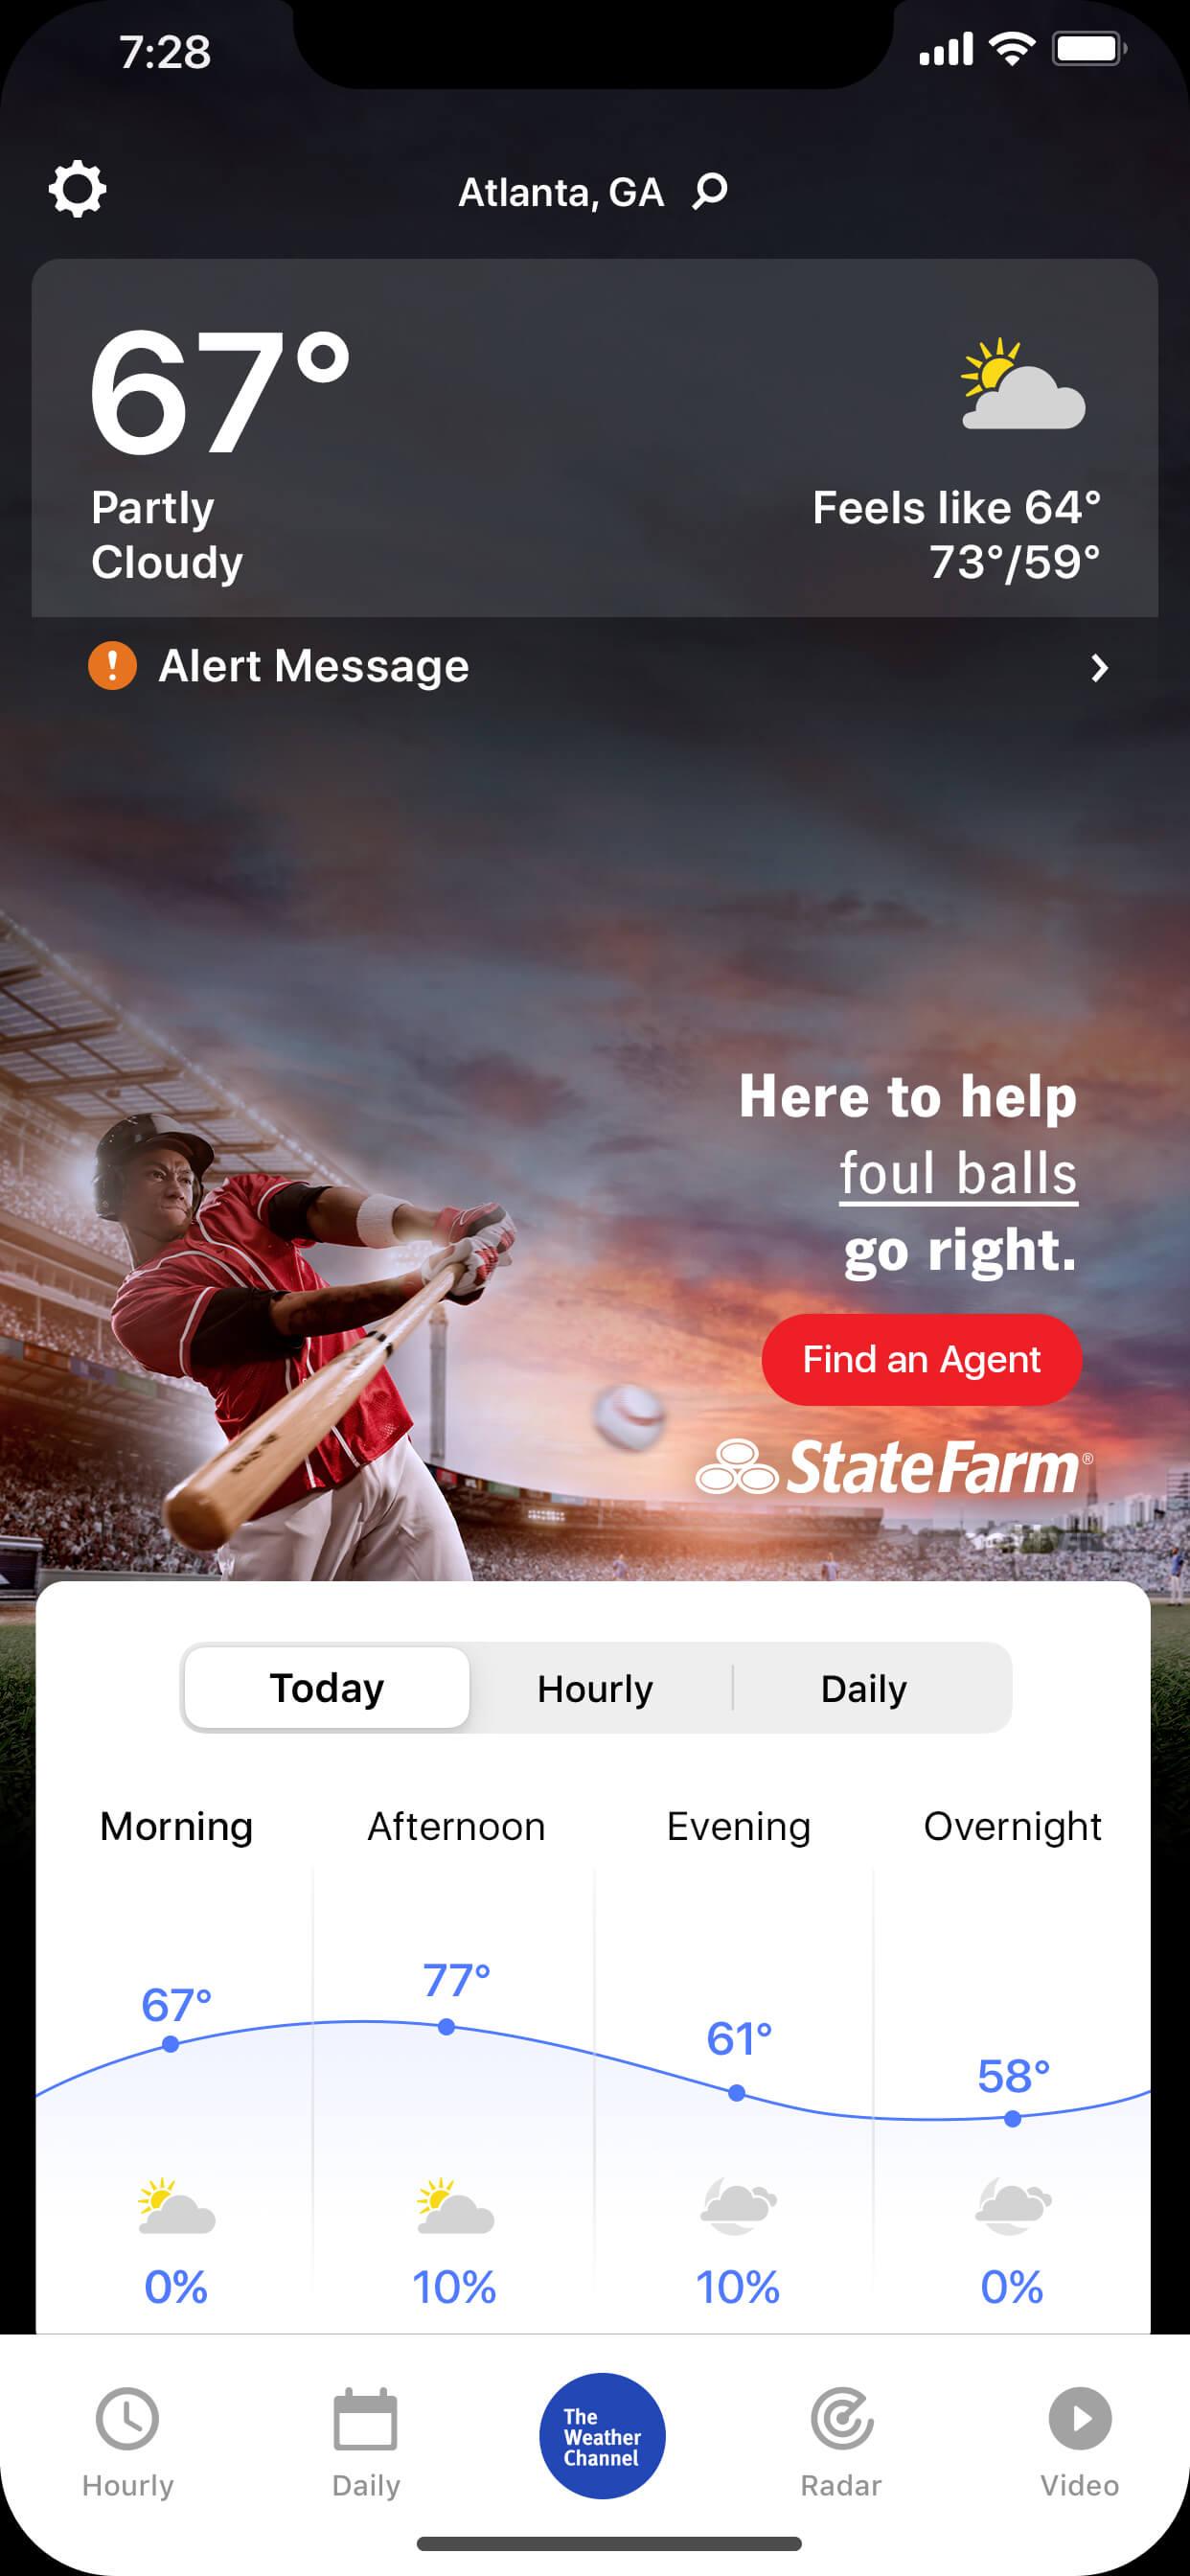 StateFarmMLB_Mobile_App-IM_NextGen-BravesMock__cloudy_day